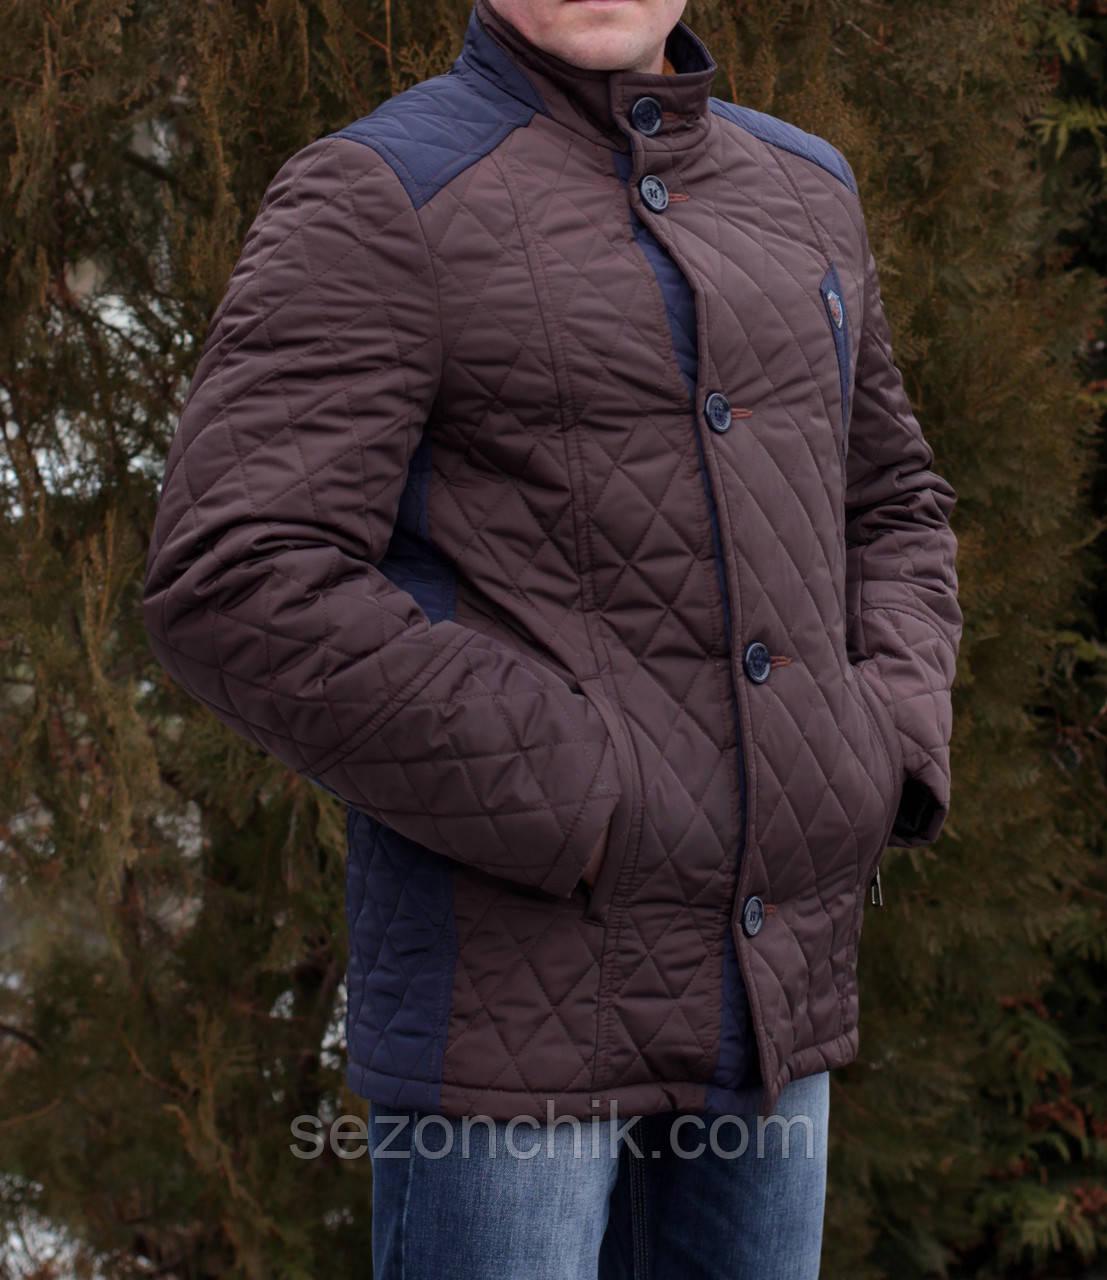 Весенняя мужская куртка модная новинка